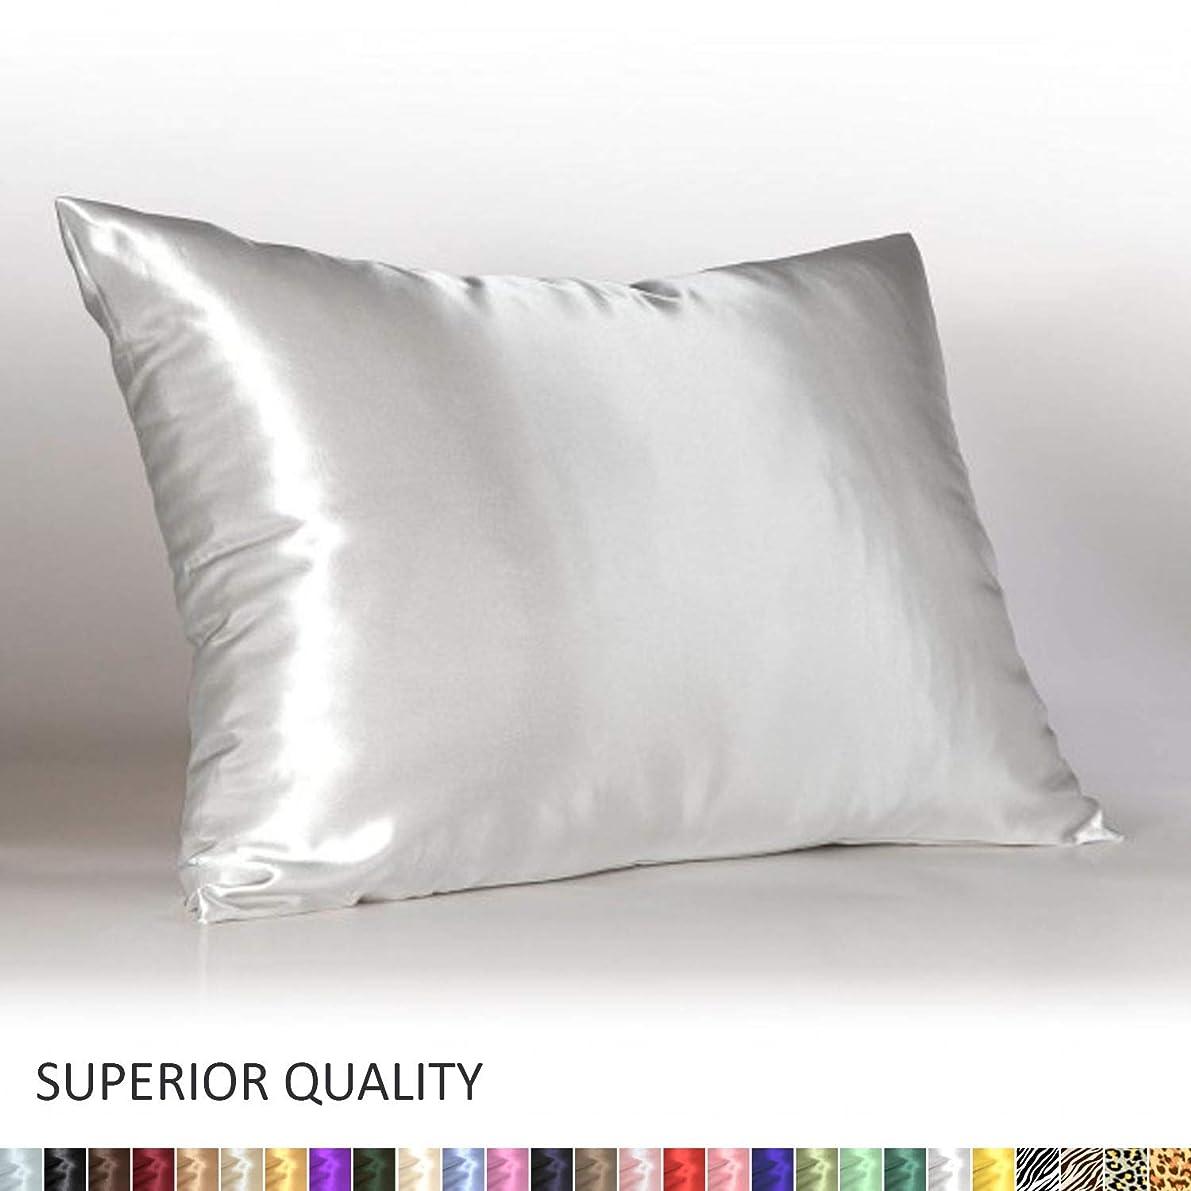 Shop Bedding Luxury Satin Pillowcase for Hair – Standard Satin Pillowcase with Zipper, White (1 per Pack) – Blissford ceamclz12